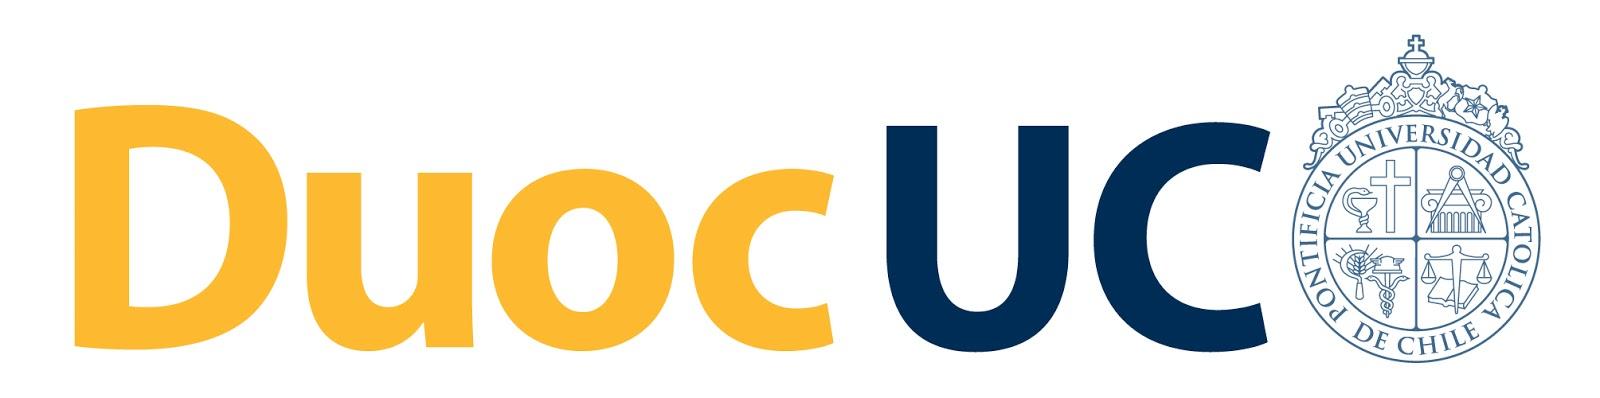 OR_Logotipo_DuocUC.jpg